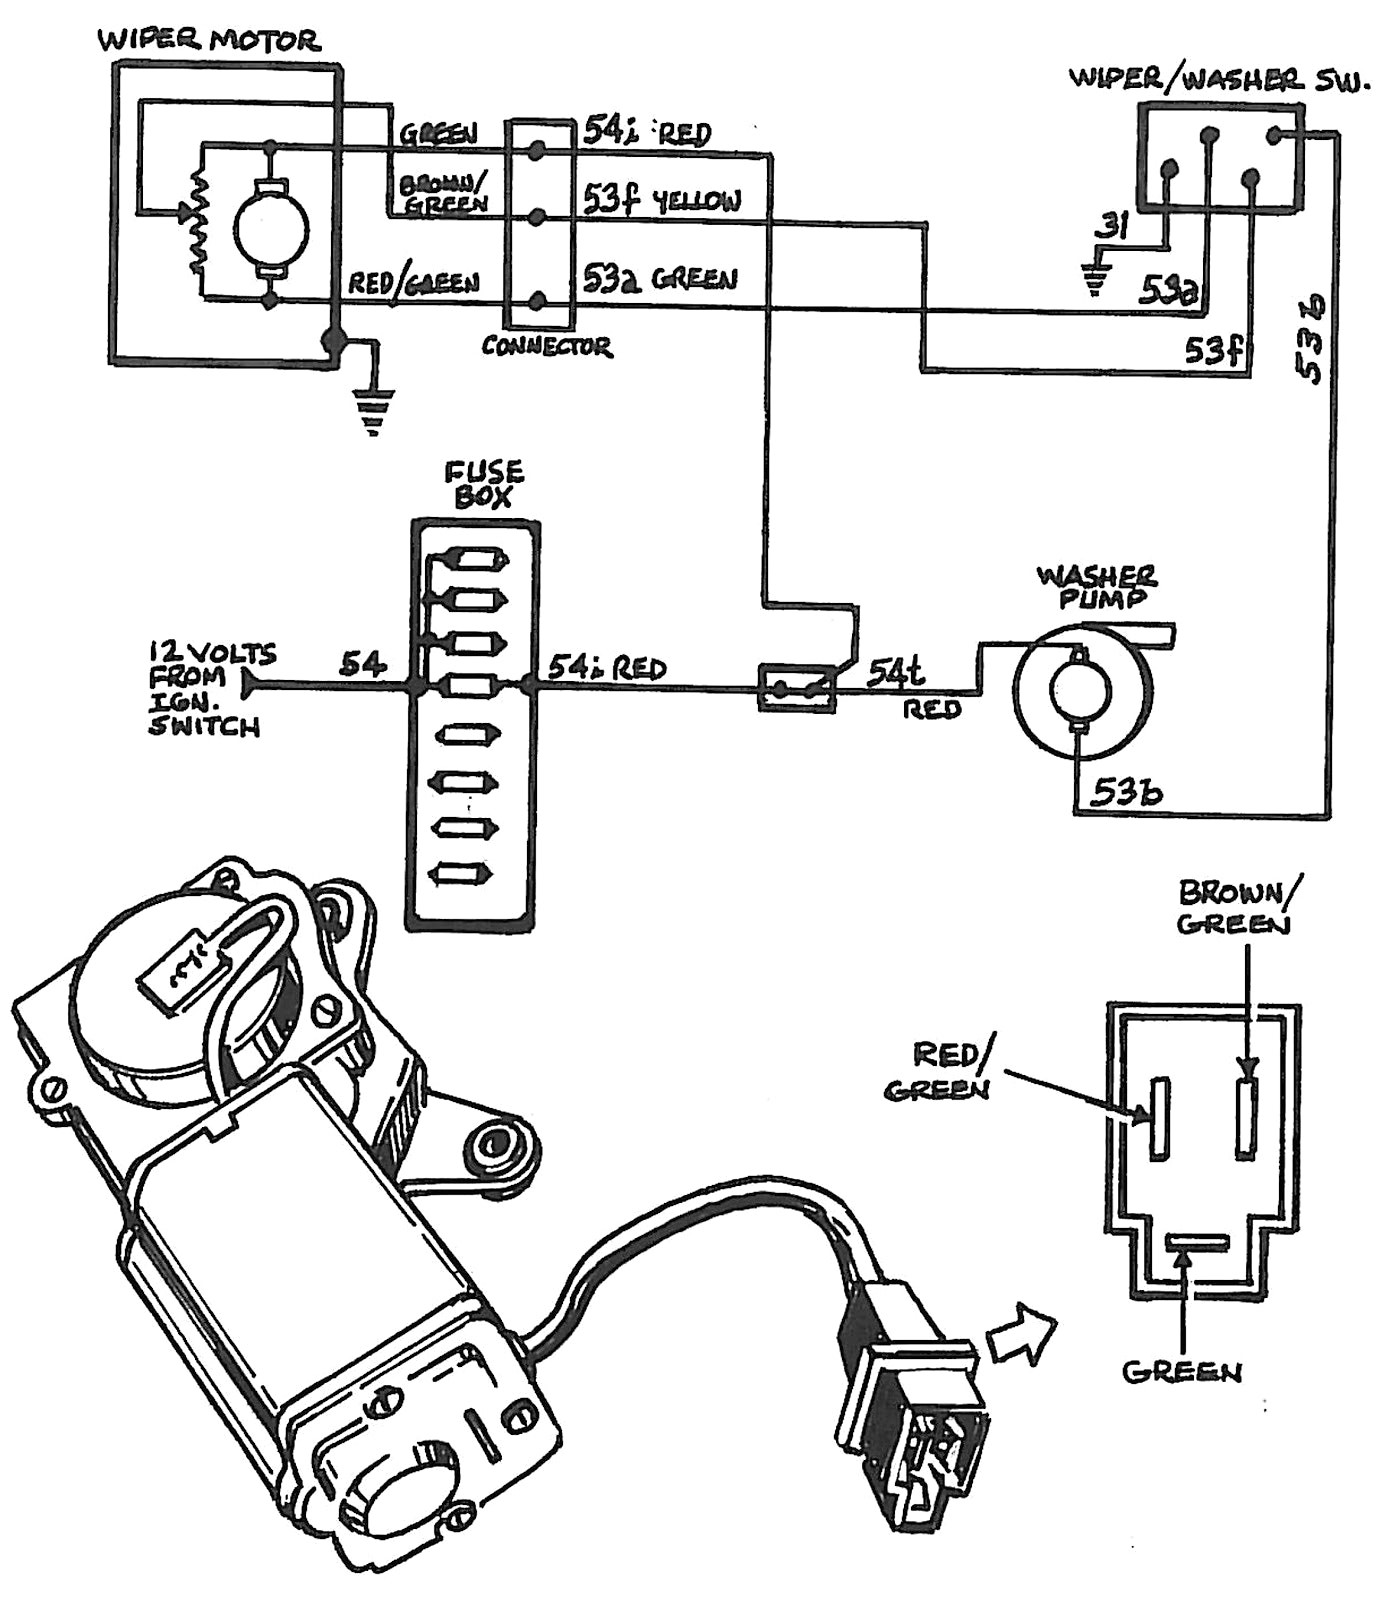 hight resolution of 1969 vw wiper motor wiring diagram 1968 gmc wiper wiring diagram vw wiper motor cover 68 1979 corvette radio wiring diagram 1972 corvette ac wiring diagram